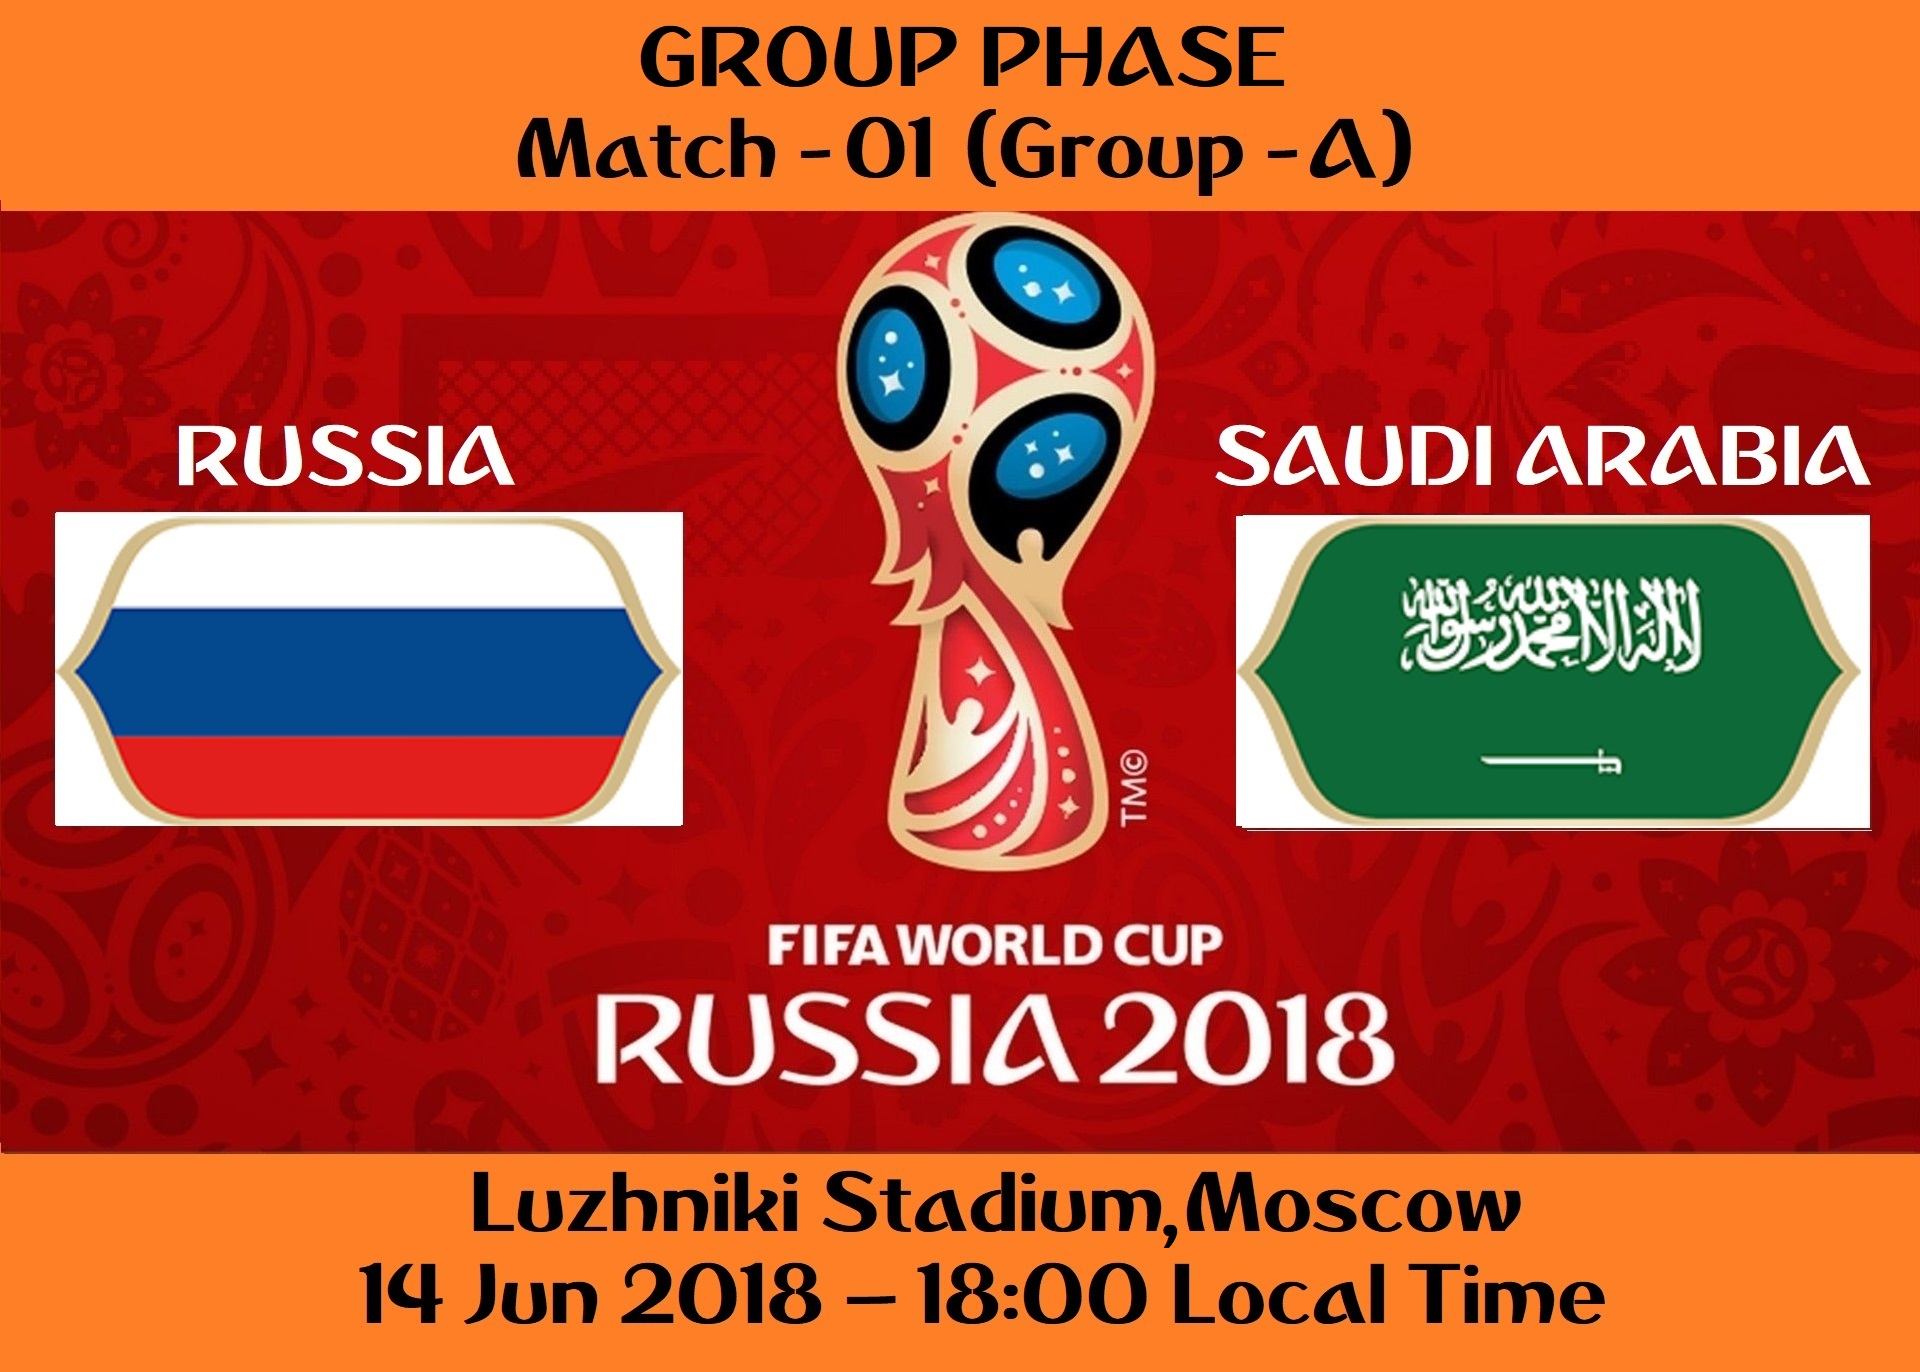 FIFA WORLD CUP 2018 MATCH - 1 - RUSSIA vs SAUDI ARABIA